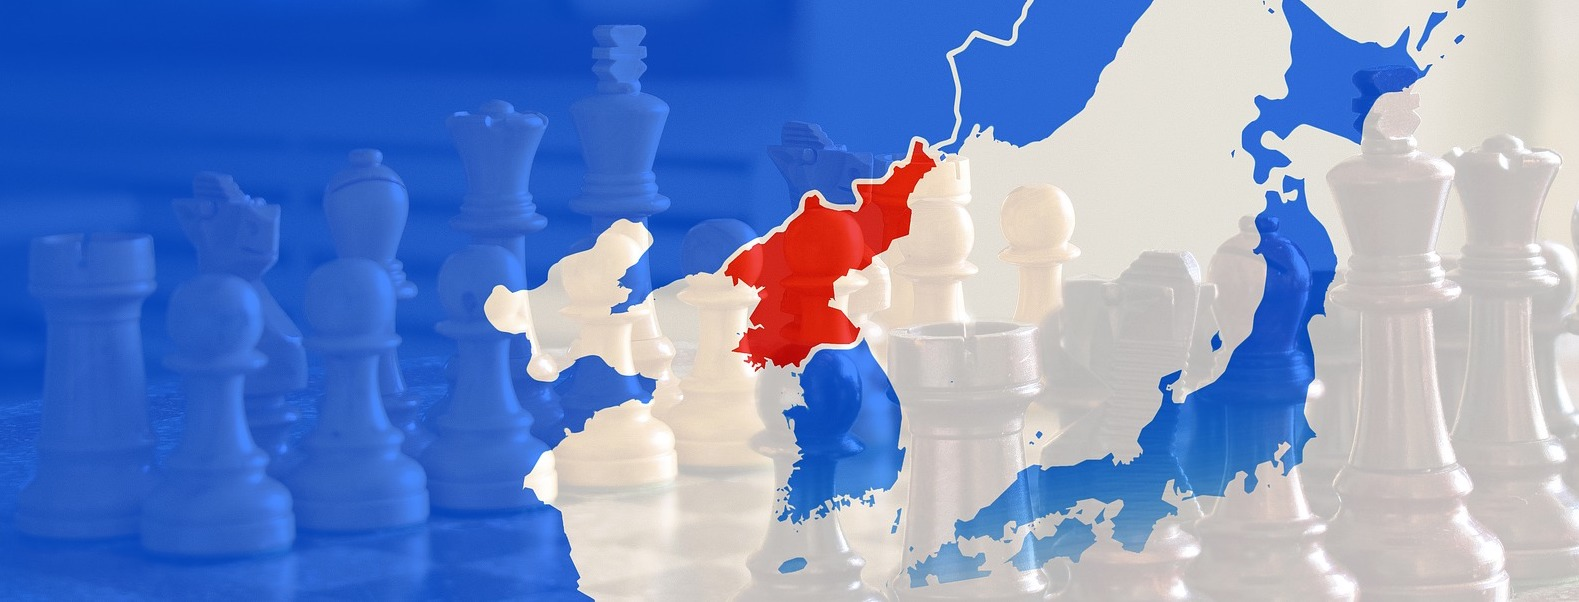 North Korea strategy